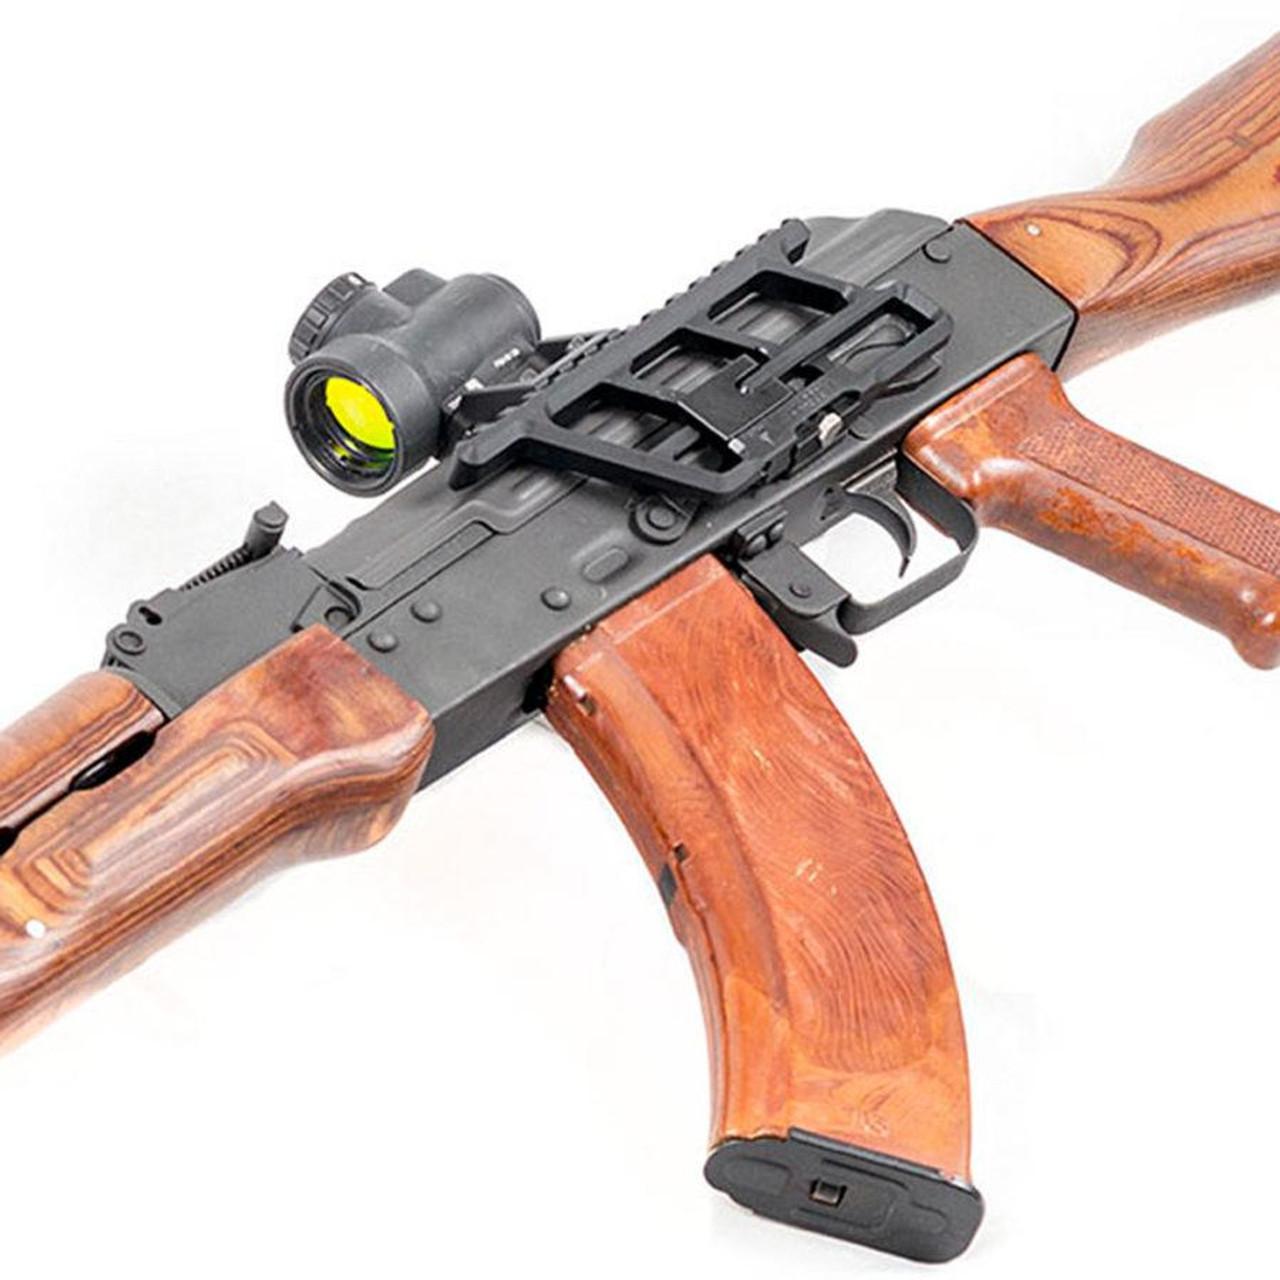 RS Regulate AK-303M Full Length Lower Optic Mount